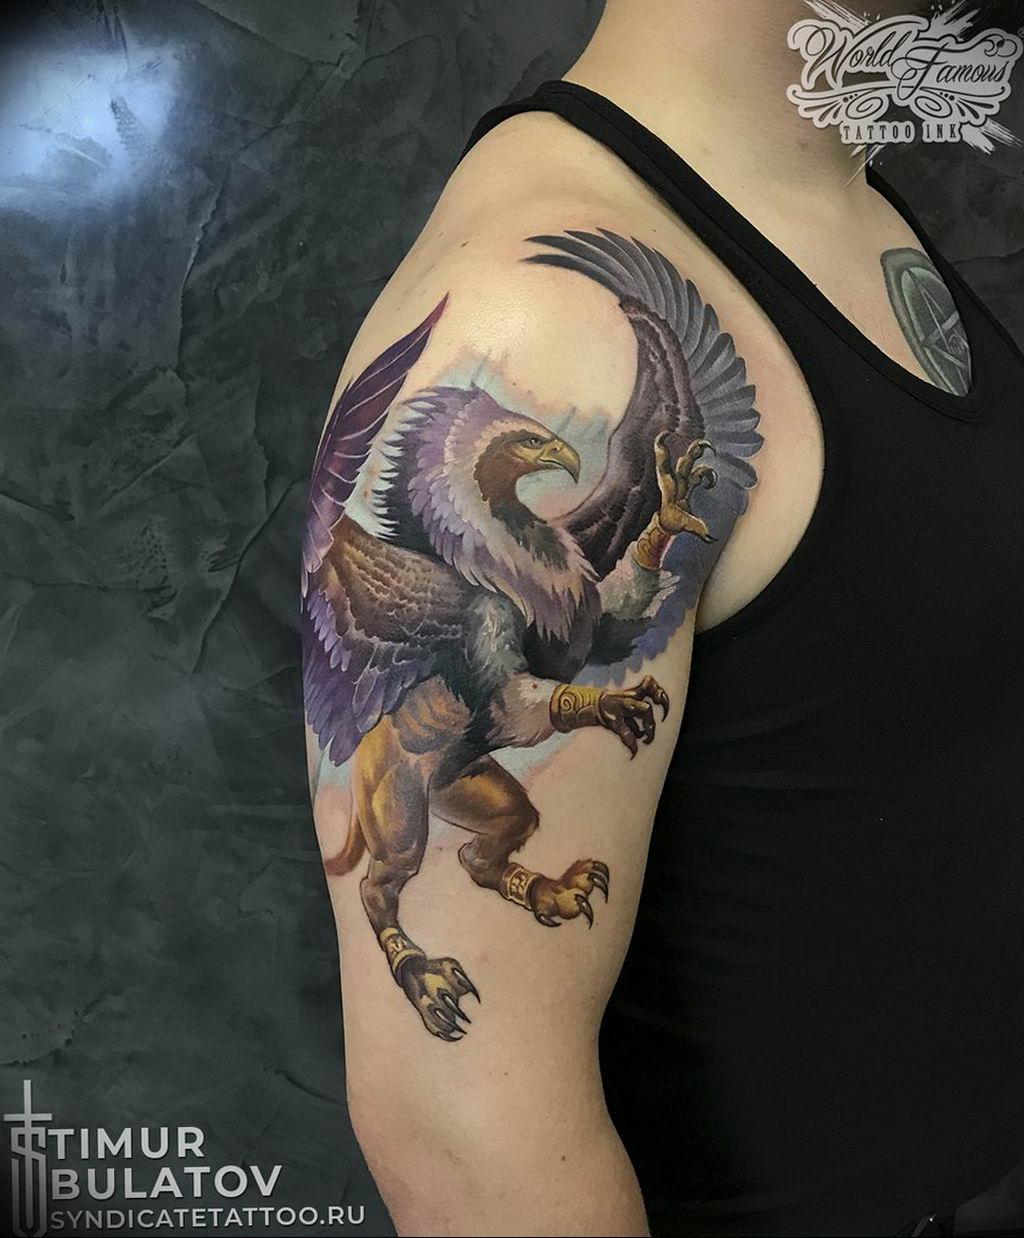 Фото тату студии Синдикат 09.09.2019 №115 - Syndicate tattoo - tatufoto.com